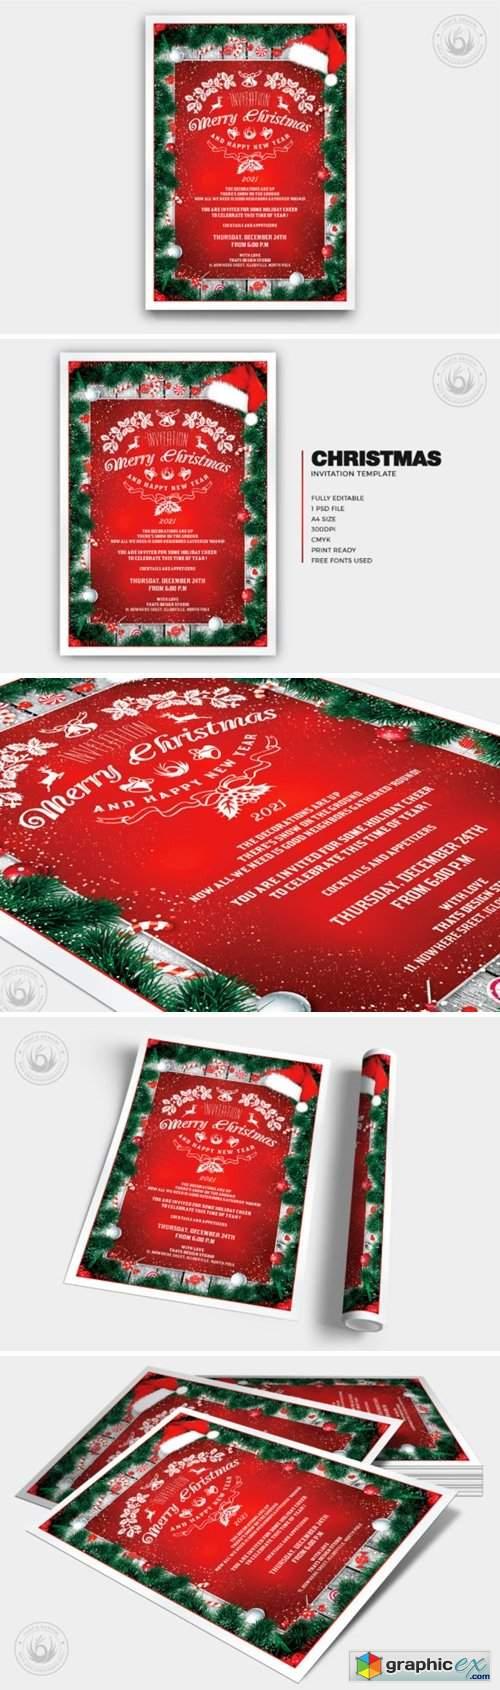 Christmas Invitation Template V6